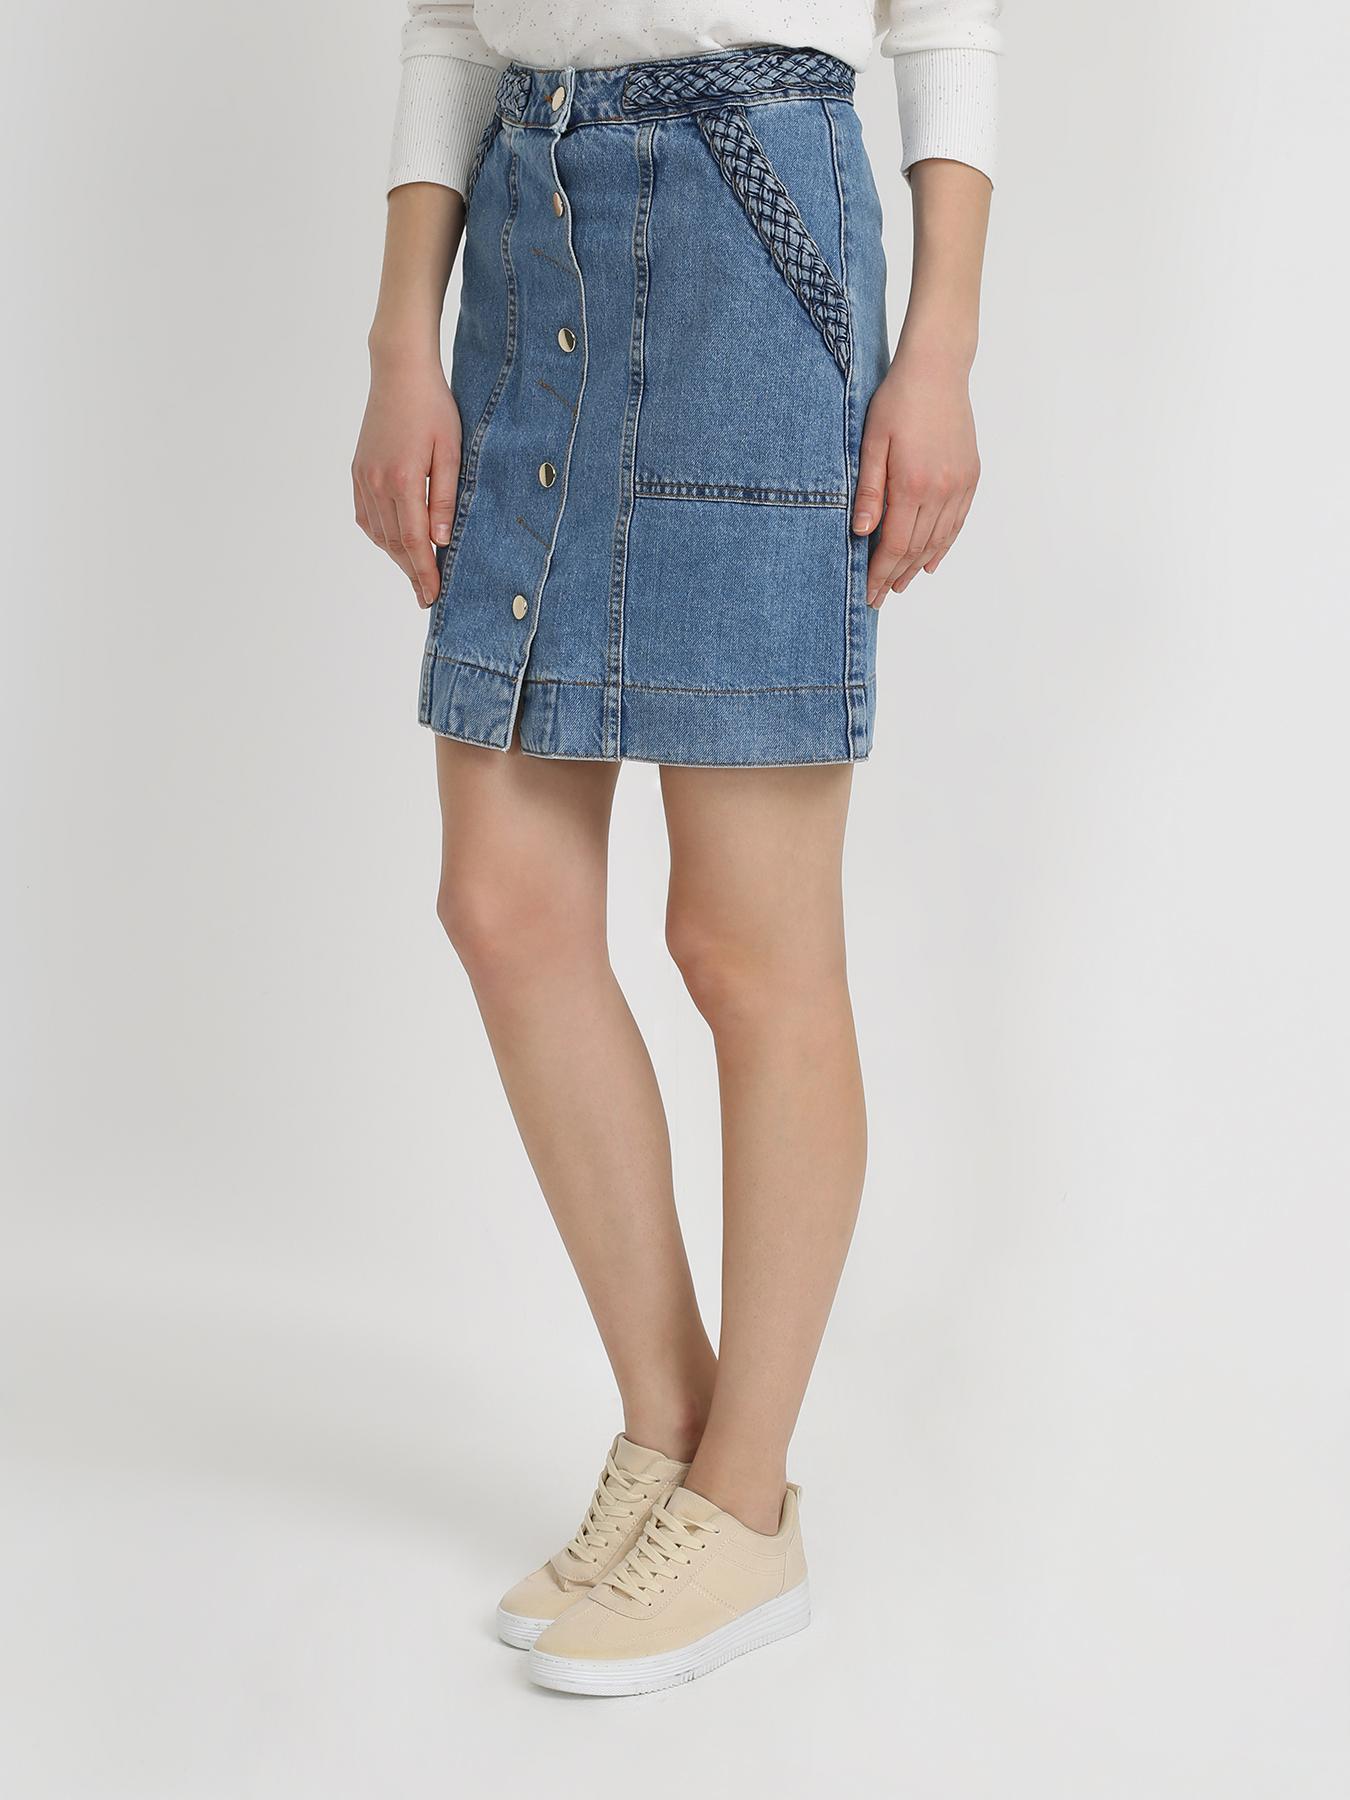 2nd day джинсовая юбка Юбки TWINSET MILANO Джинсовая юбка